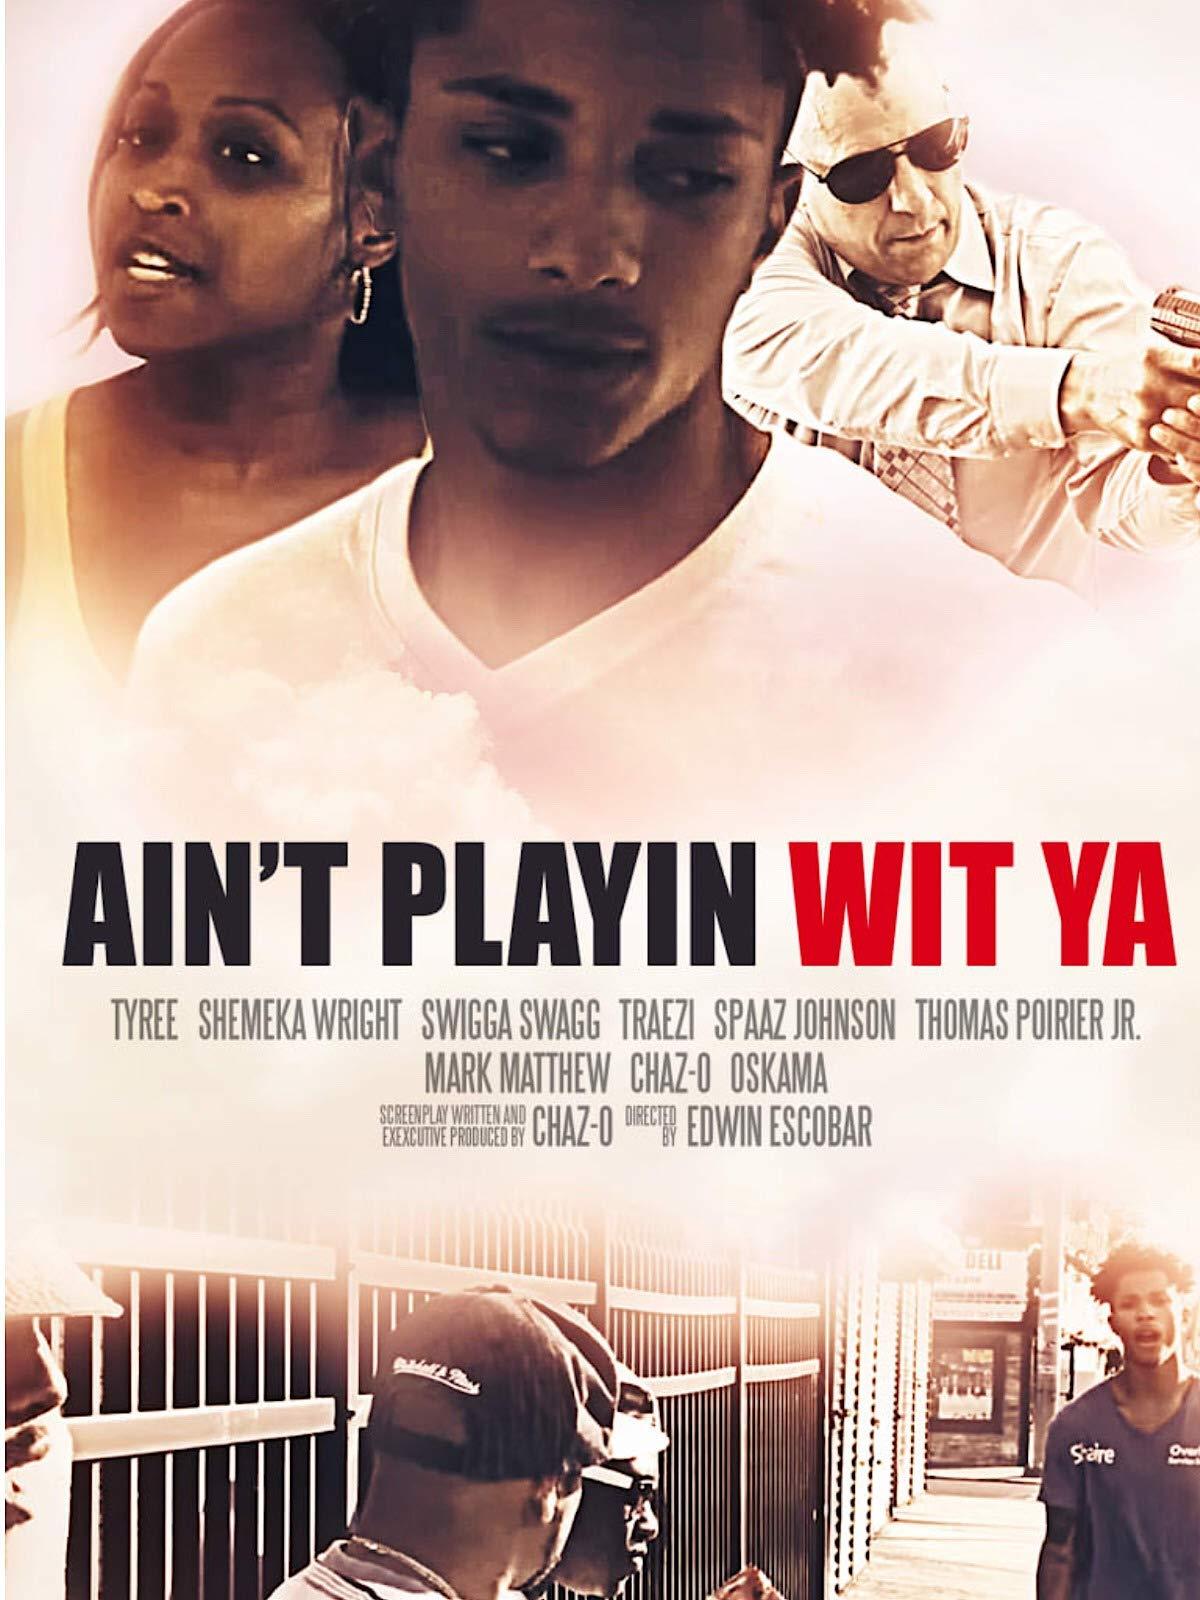 Ain't Playin Wit Ya